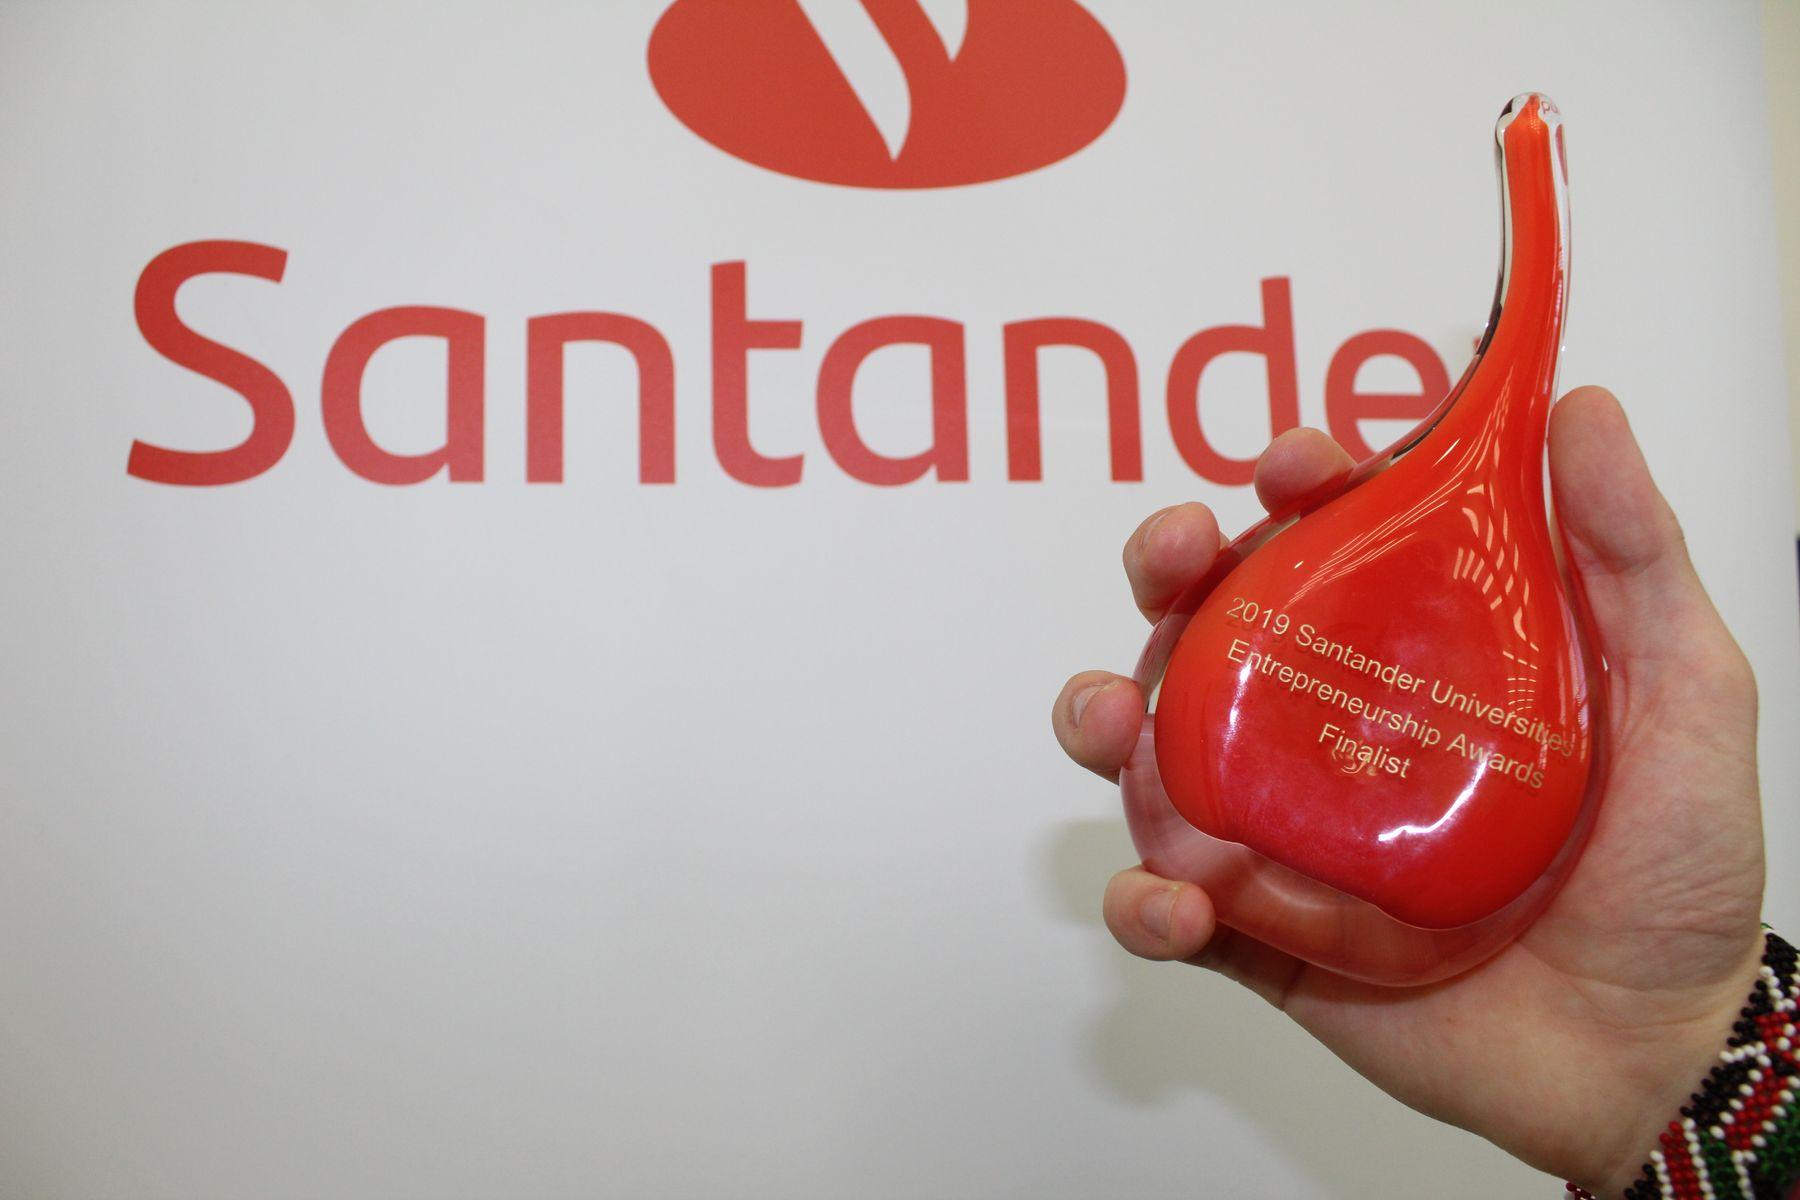 Santander award 2019